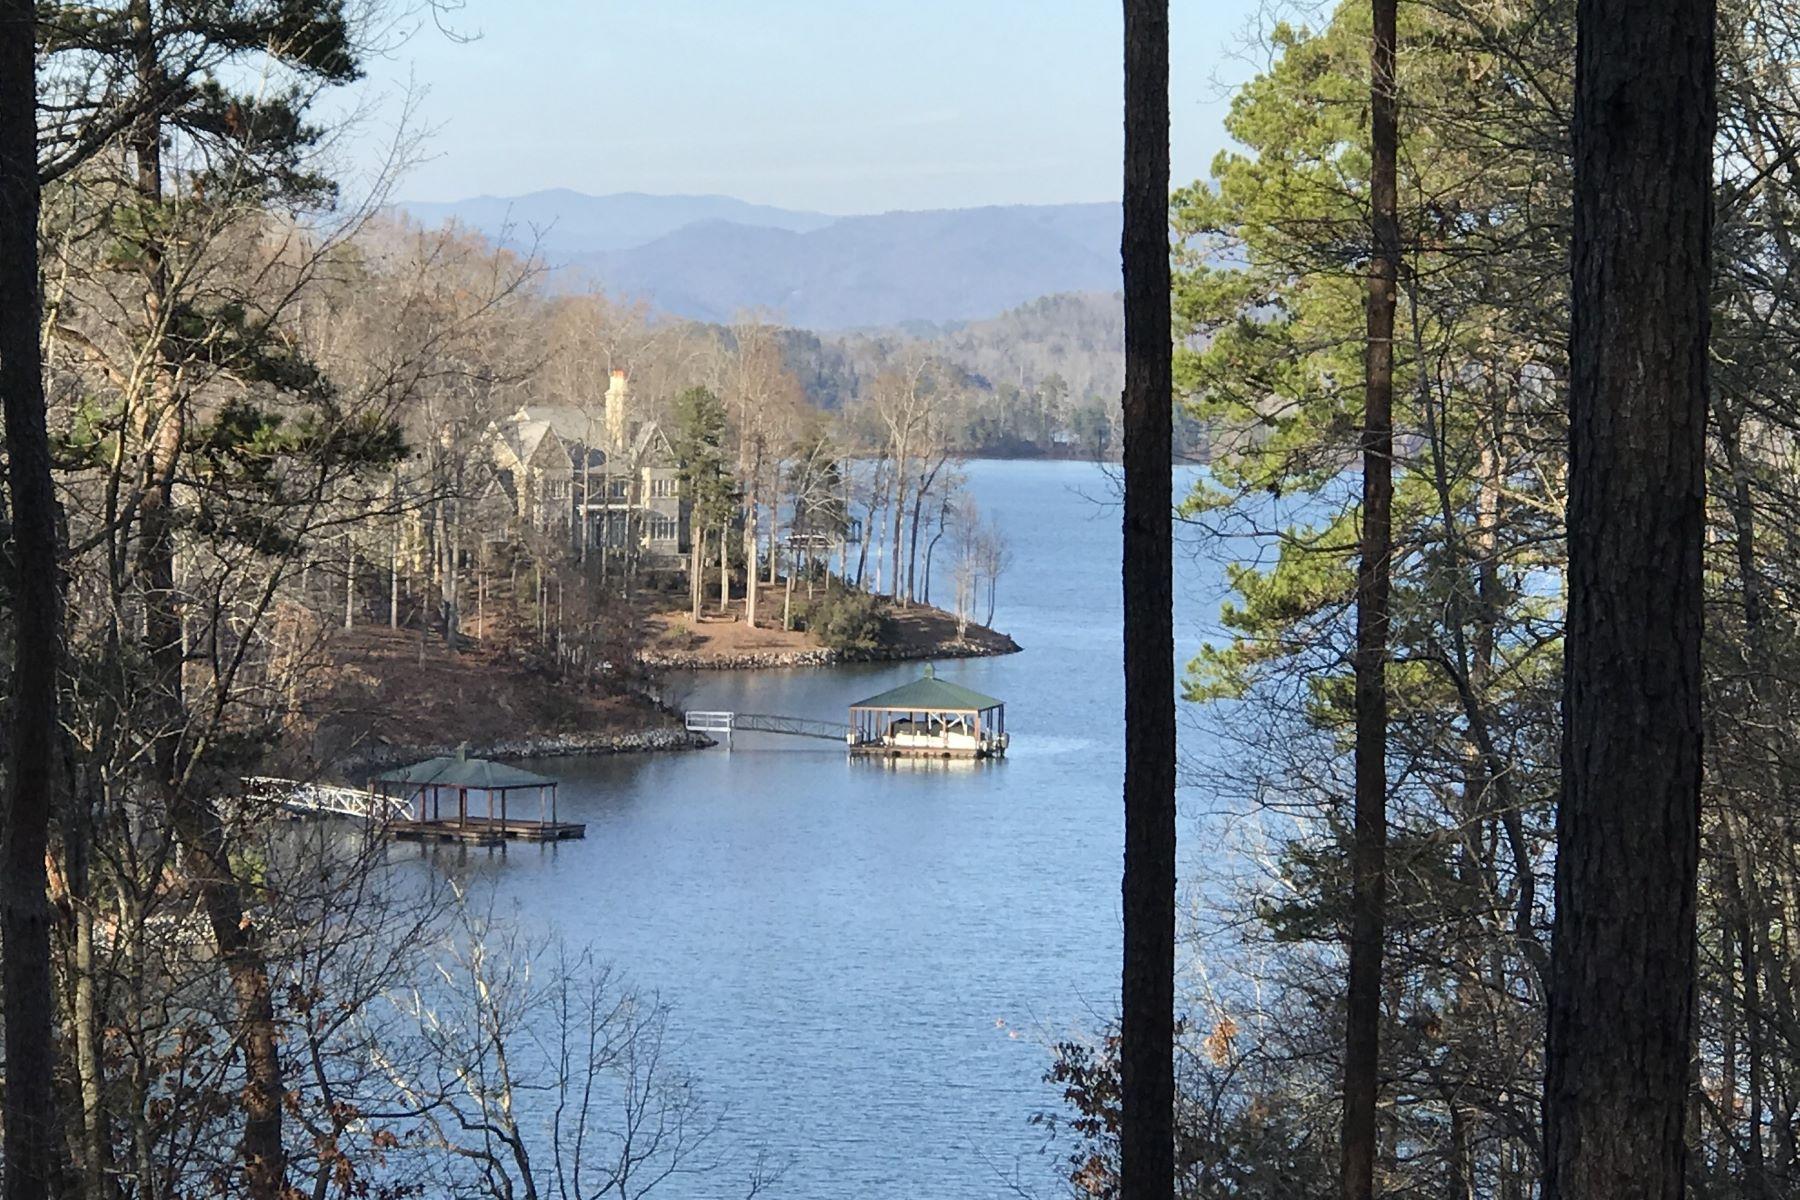 أراضي للـ Sale في Waterfront Lots with Crystal Clear Lake & Mountain Views CFS LP72, The Cliffs At Keowee Falls, Salem, South Carolina, 29676 United States